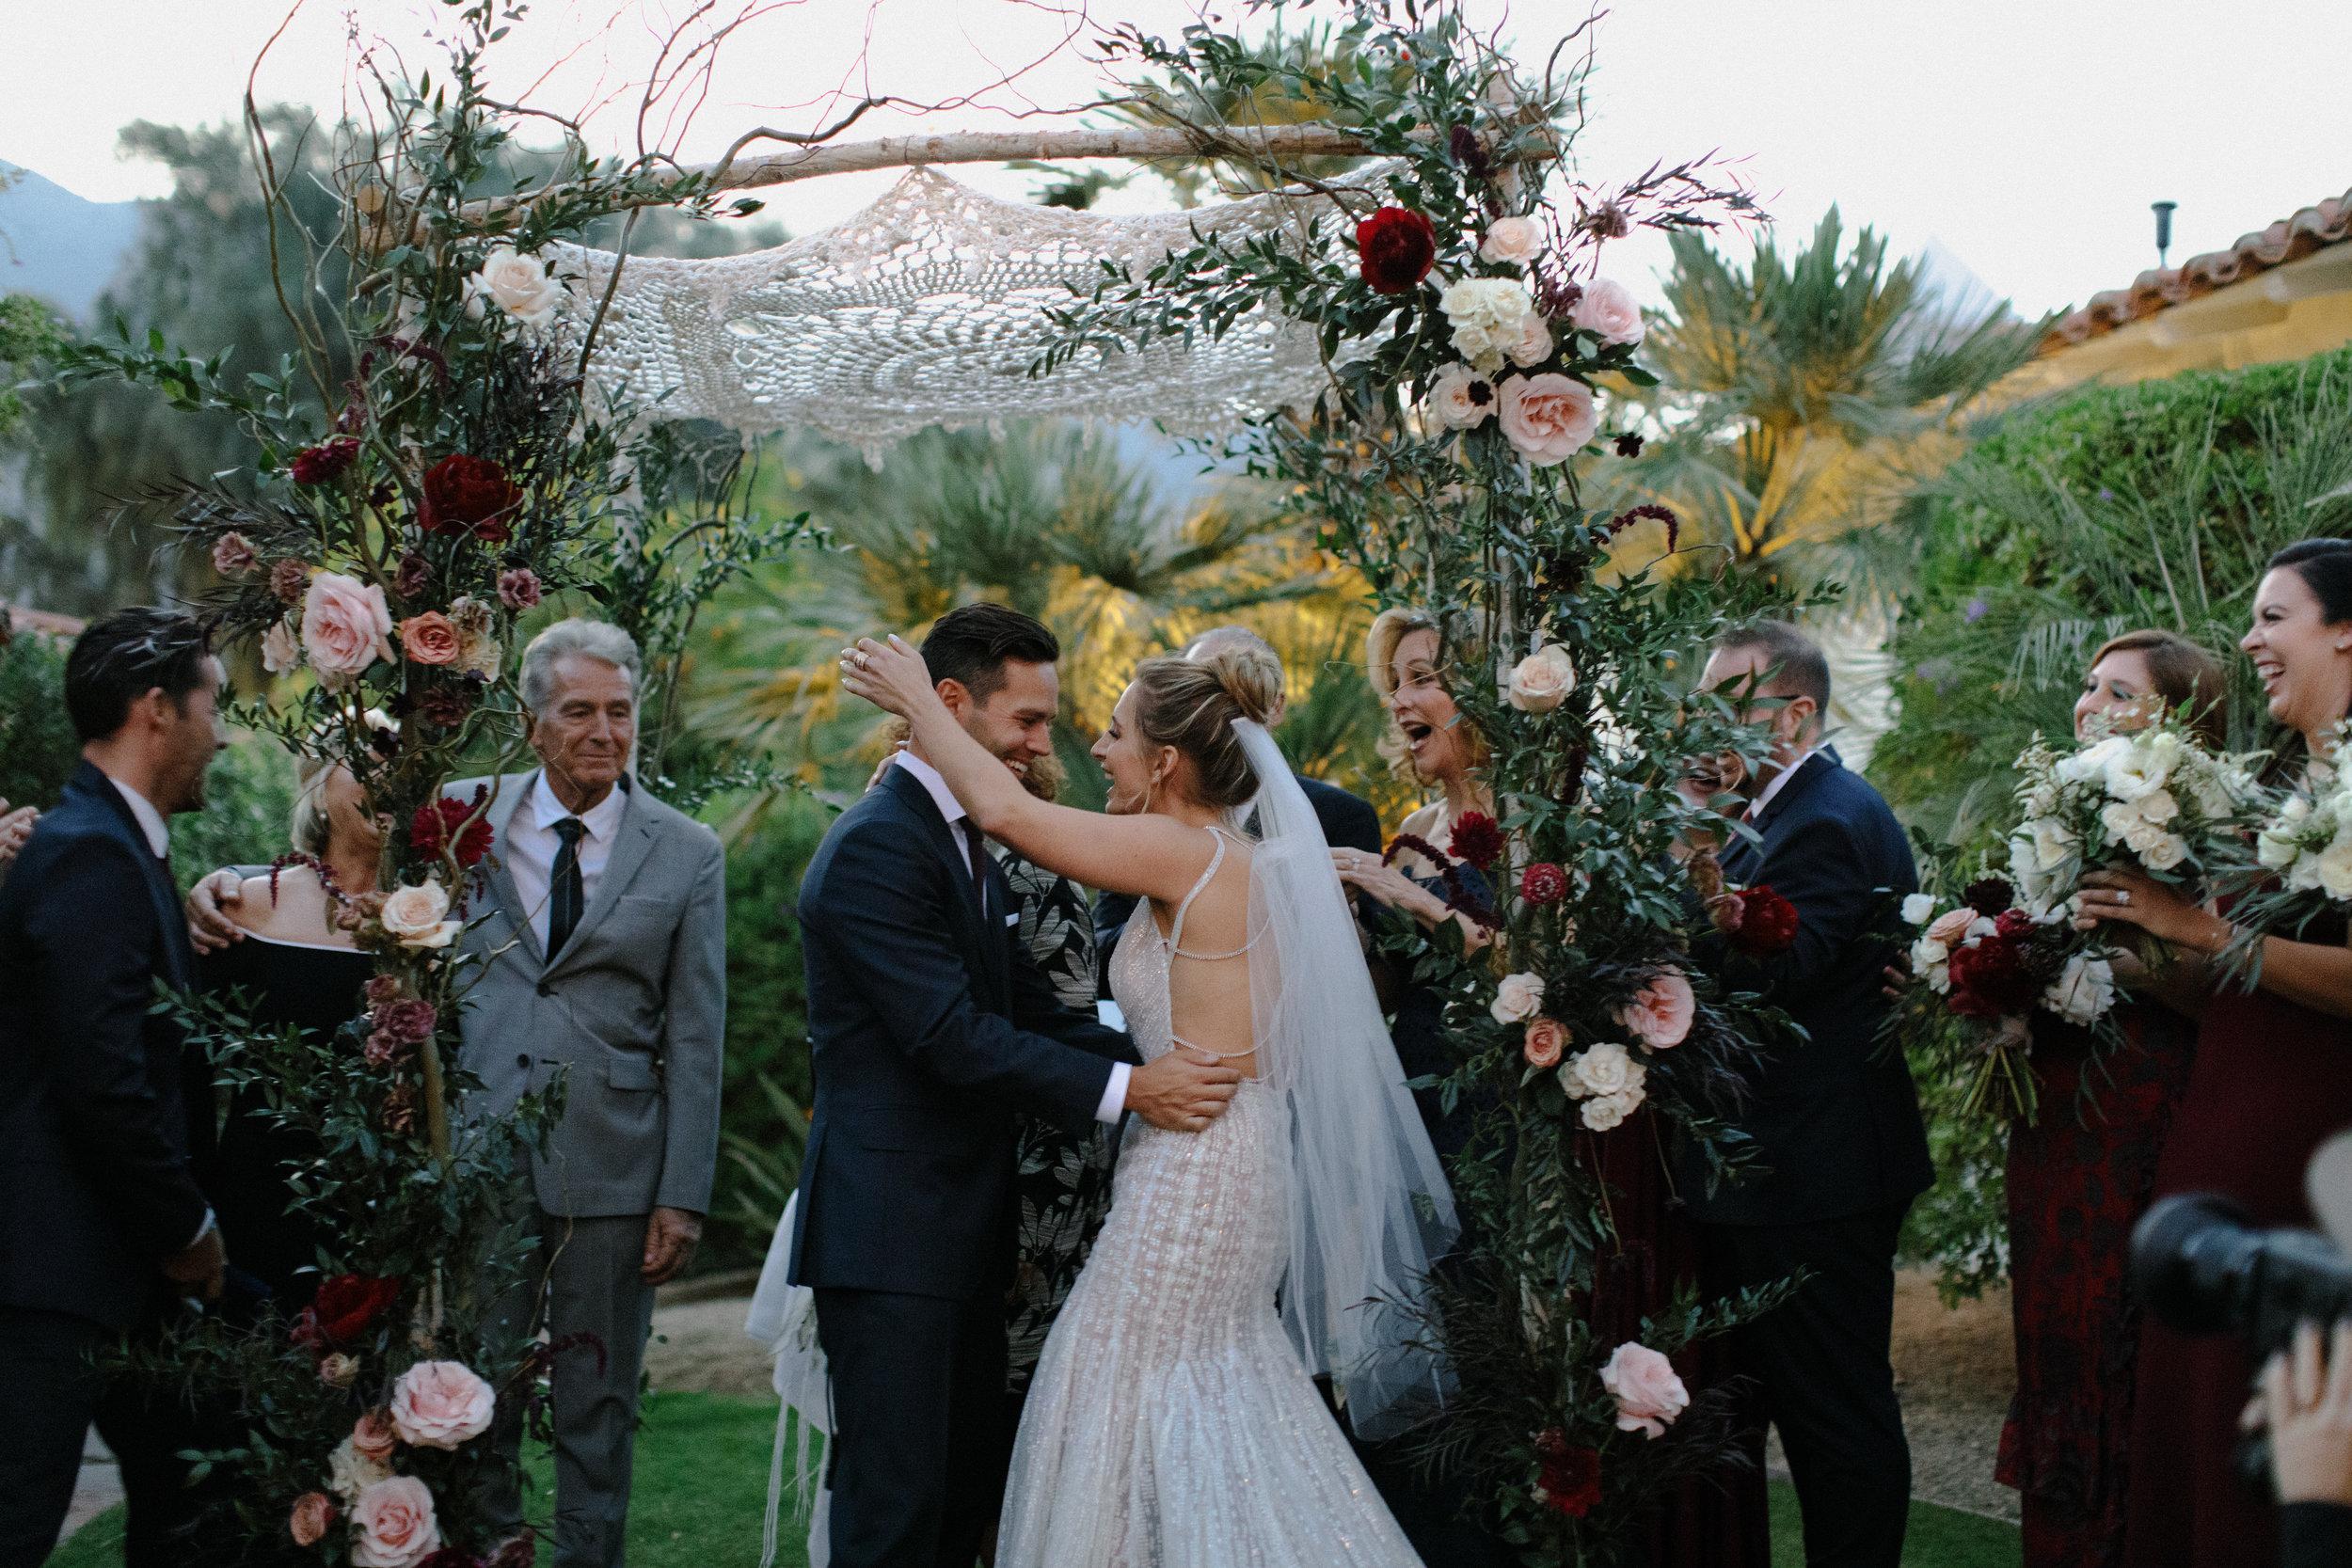 Dara_&_Garrett_Colony_Palms_Hotel_Wedding_Photos-415.jpg